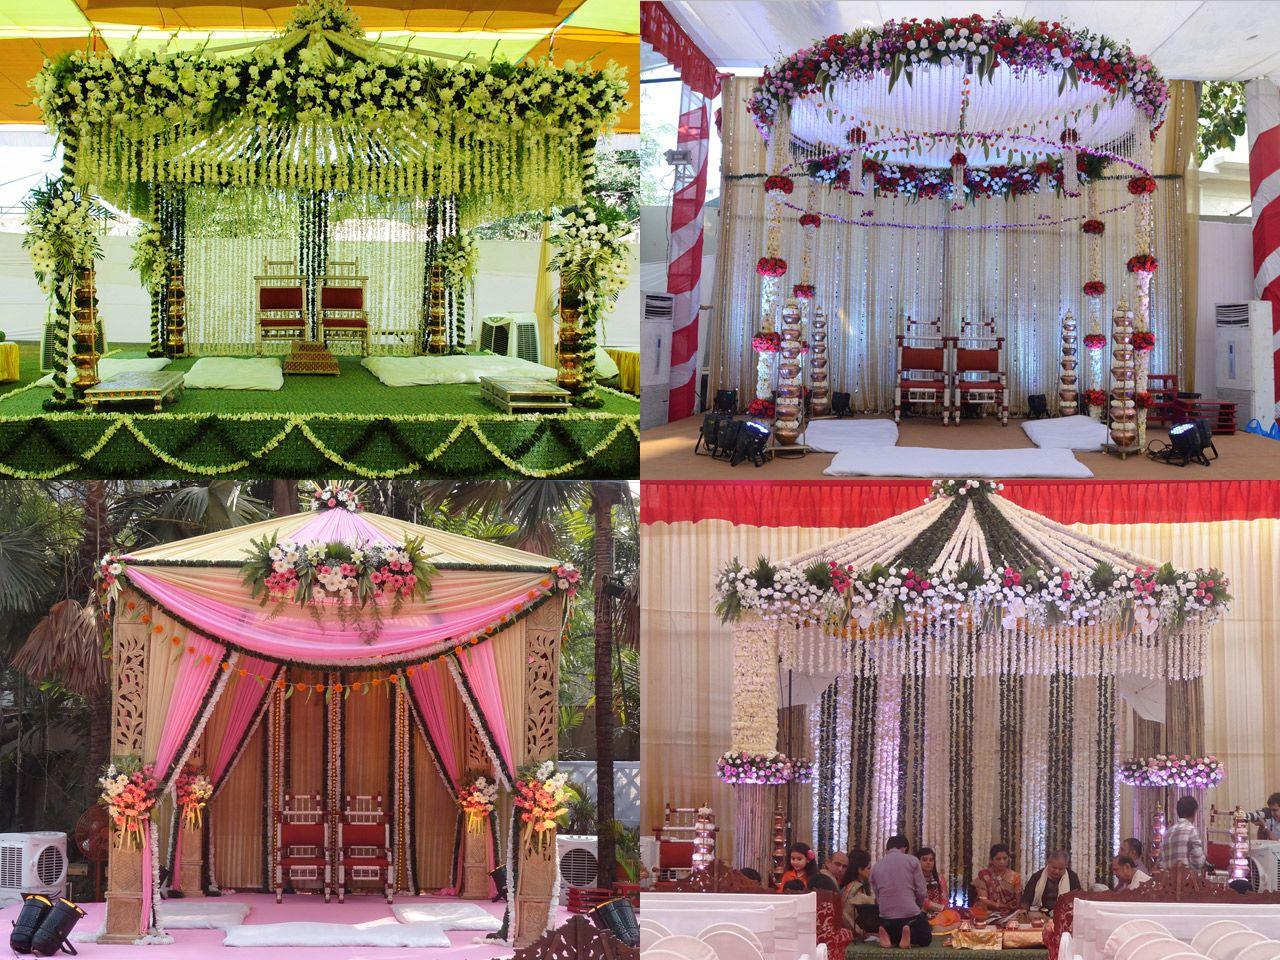 Mumbai Indian Wedding Reception Decorators And Planners Goa Beach Wedding Planning And Mandap Stage Decorat Wedding Decorations Beach Wedding Planning Wedding